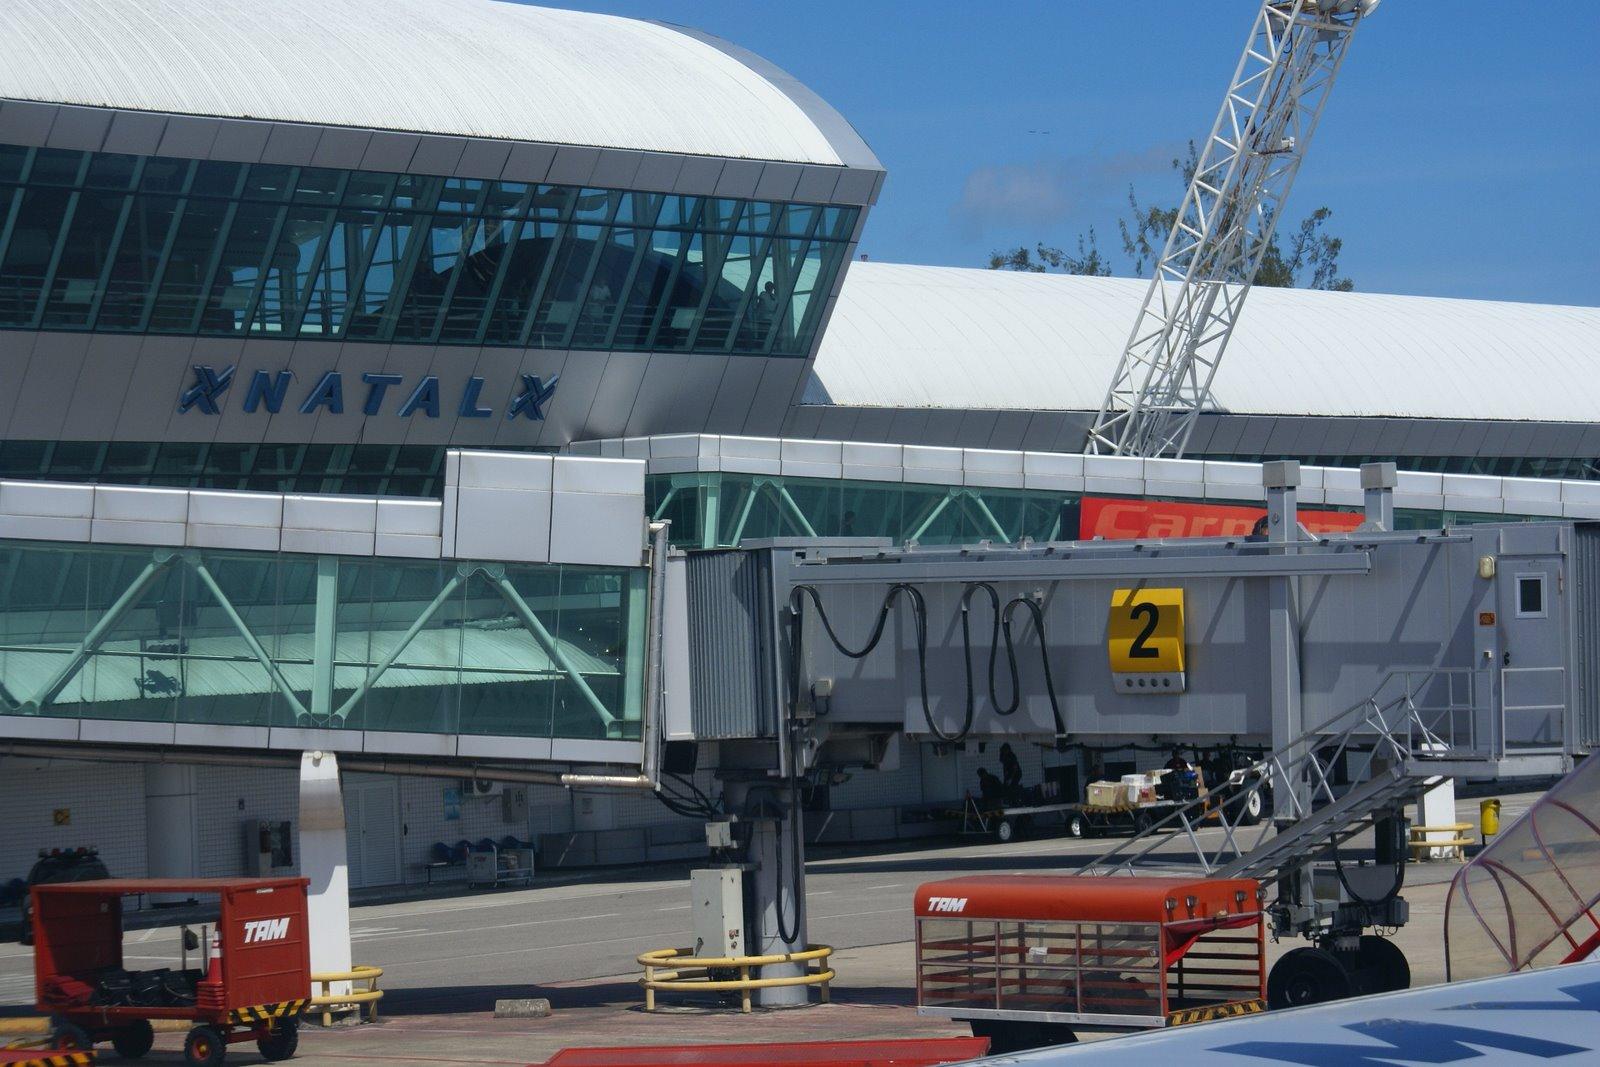 Aeroporto De Natal : F l y i n g ☜☆☞ novo aeroporto de natal deve estar